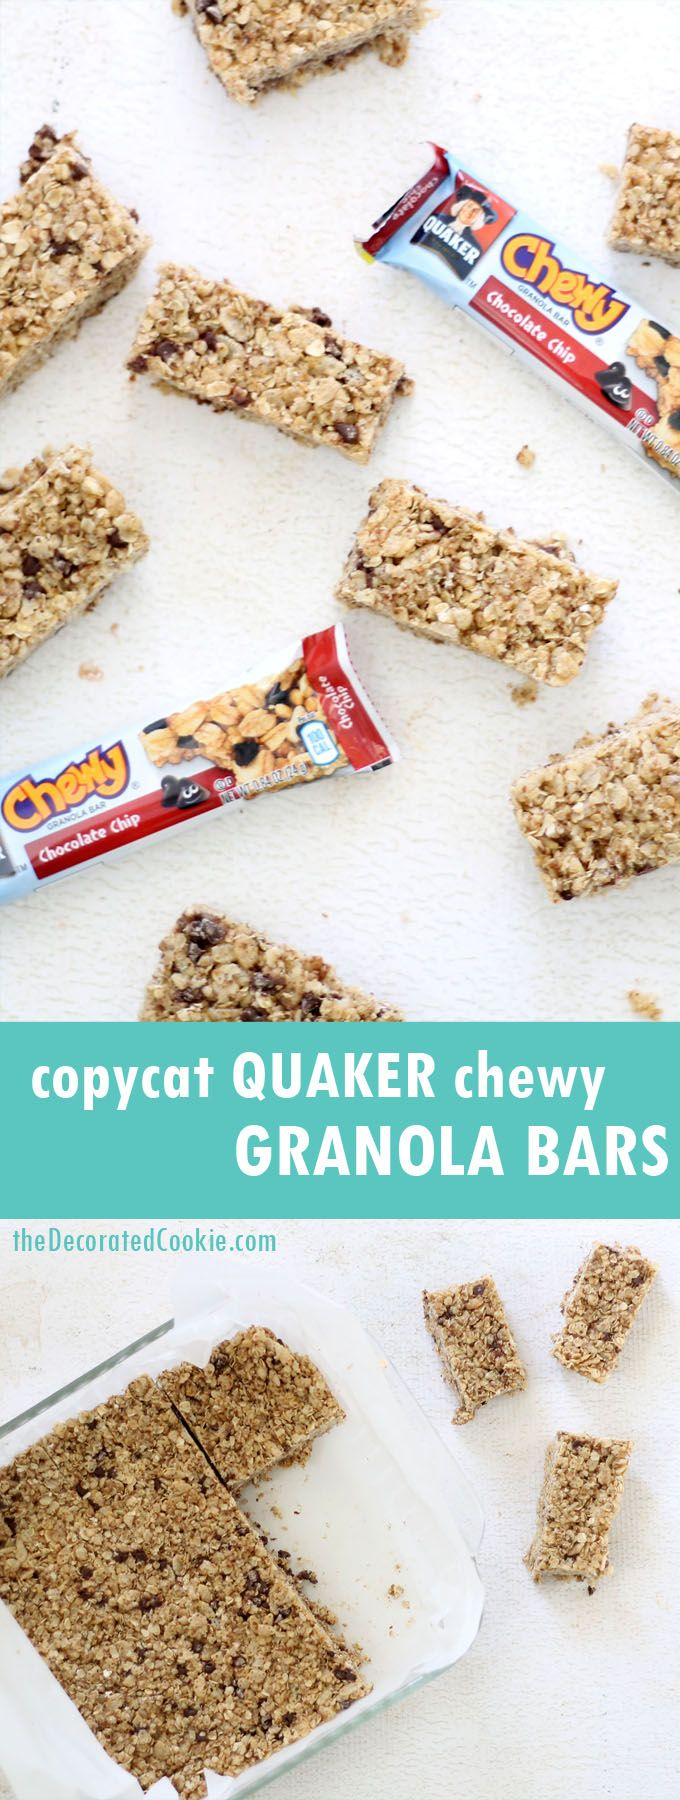 copycat Quaker chewy chocolate chip granola bars